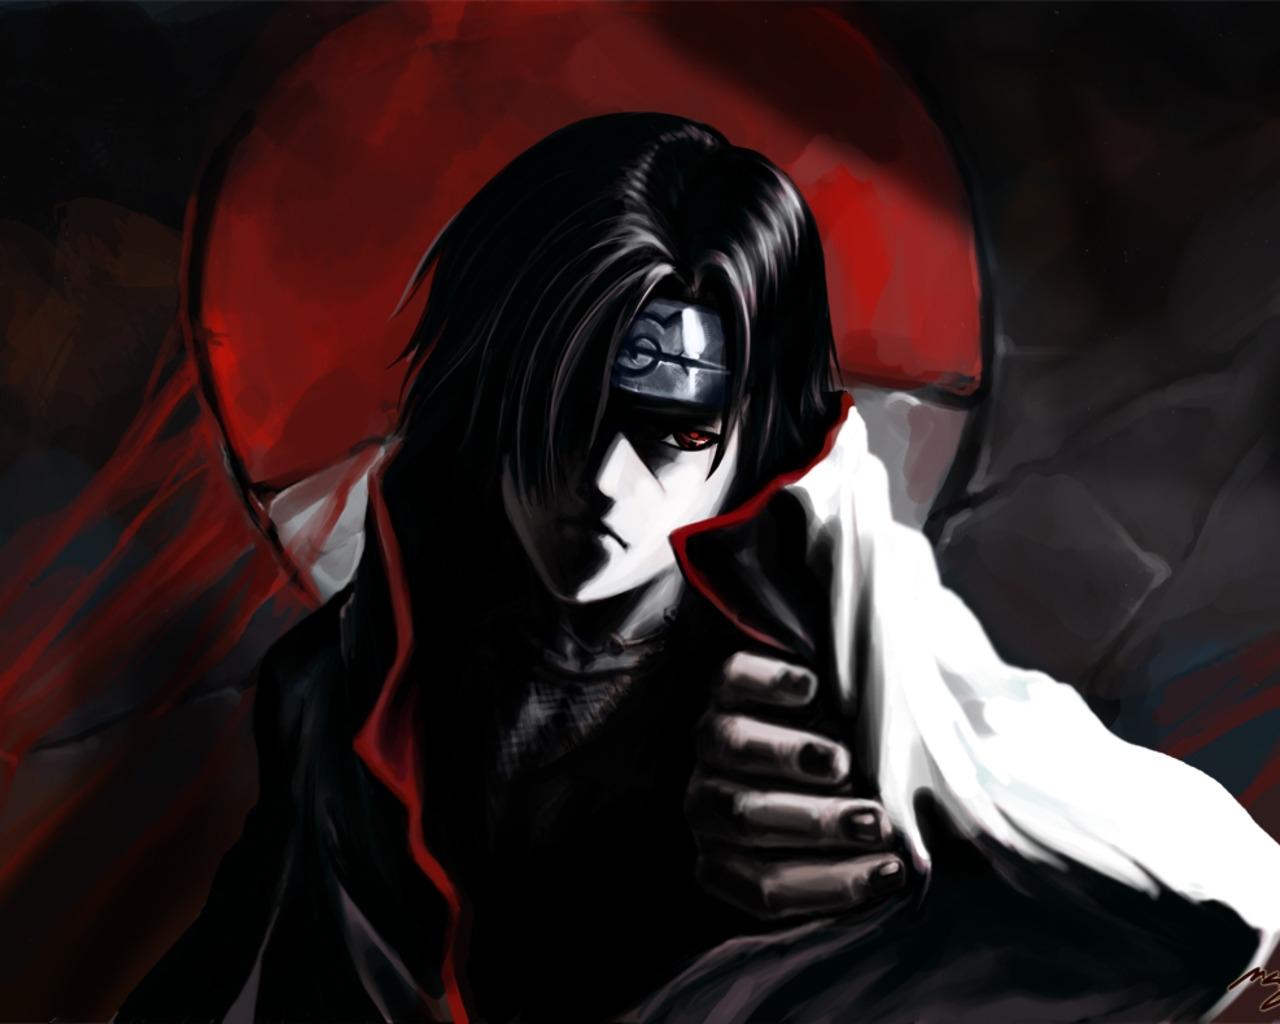 Naruto Shippuuden images Narutos Hatred Against Sasuke HD 1280x1024